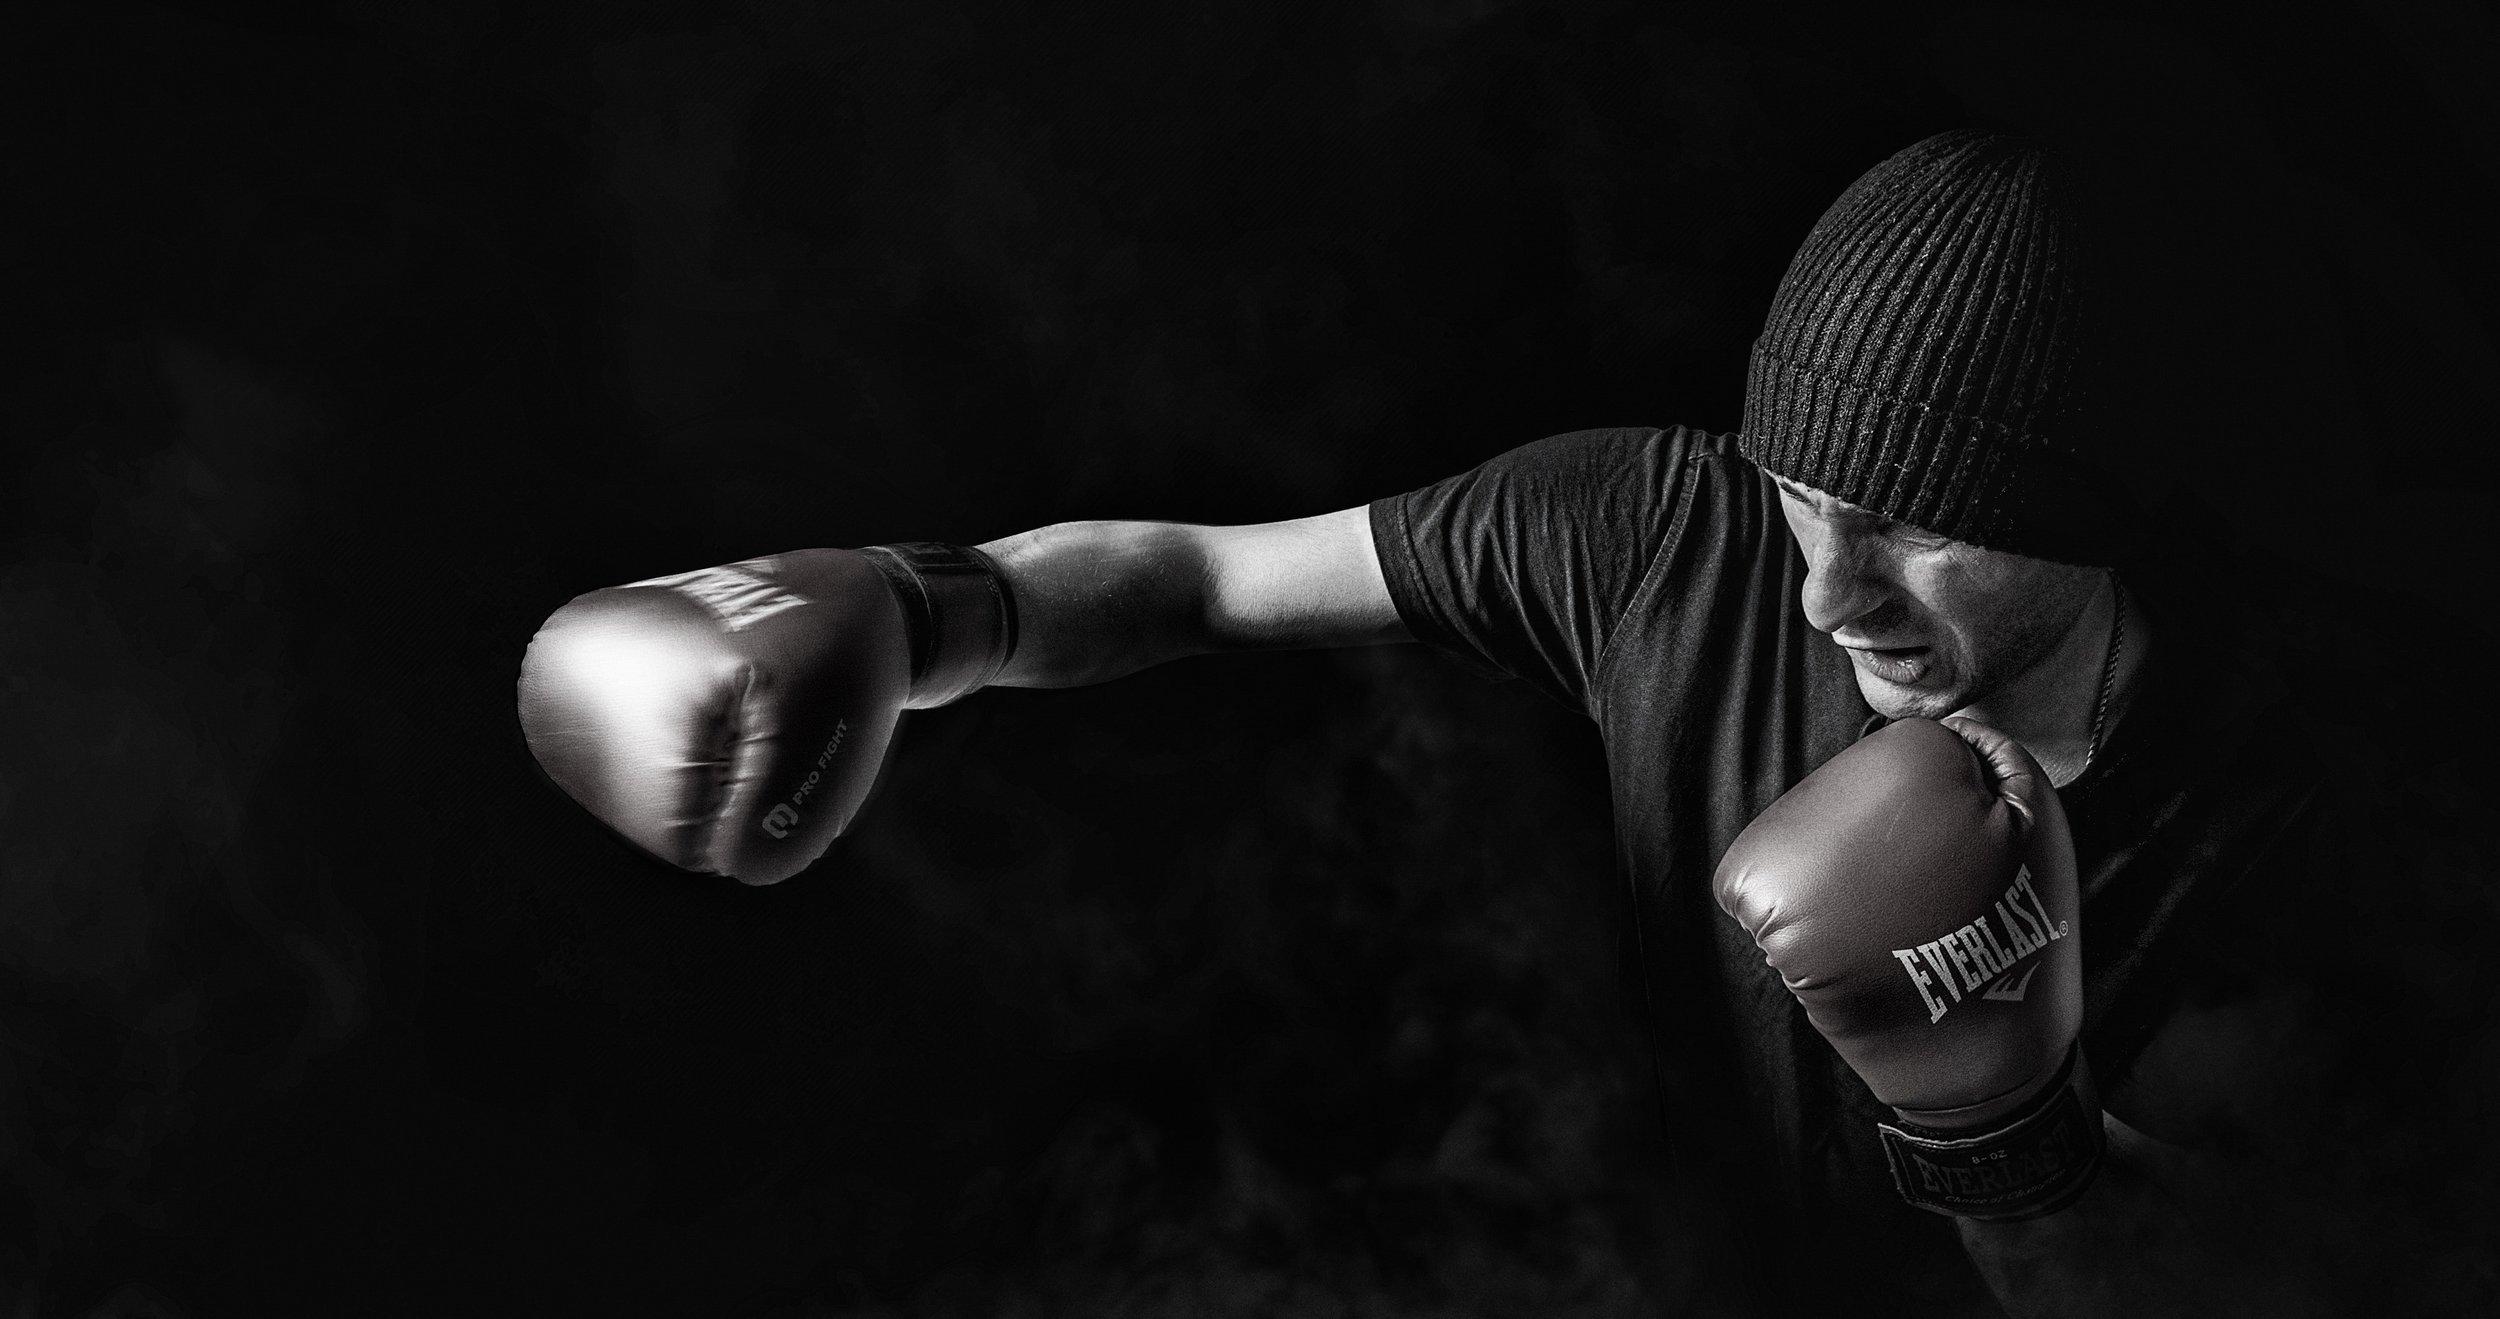 adult-athlete-black-and-white-163403.jpg